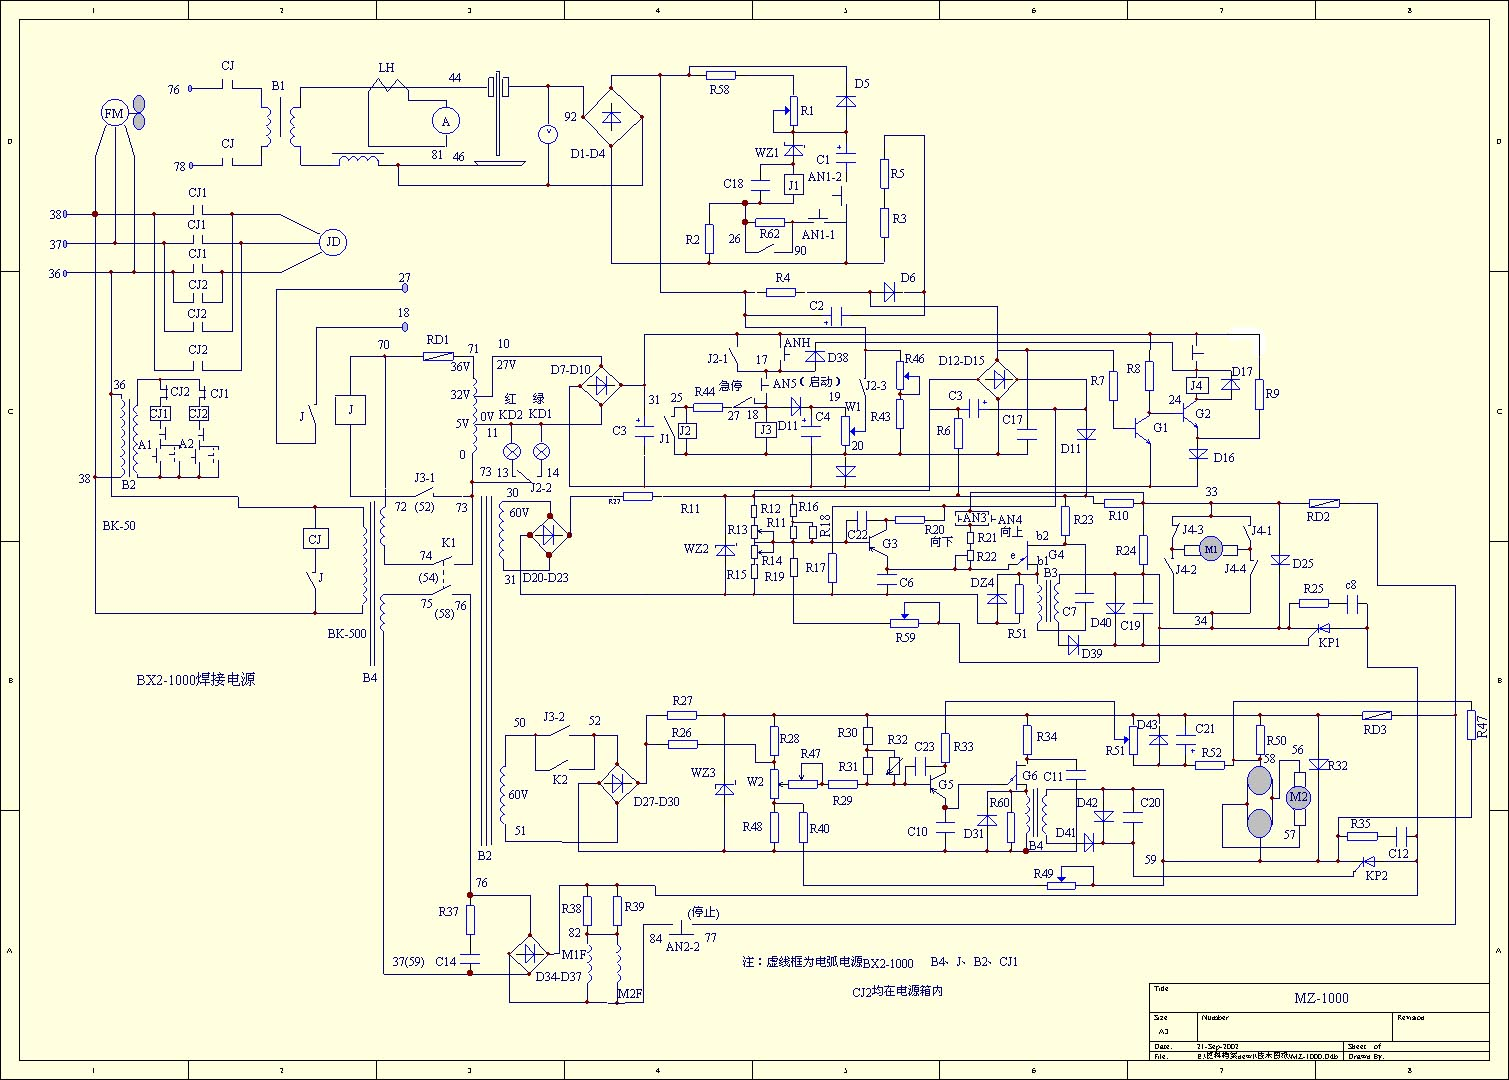 mz-1000自动埋弧焊机使用说明书